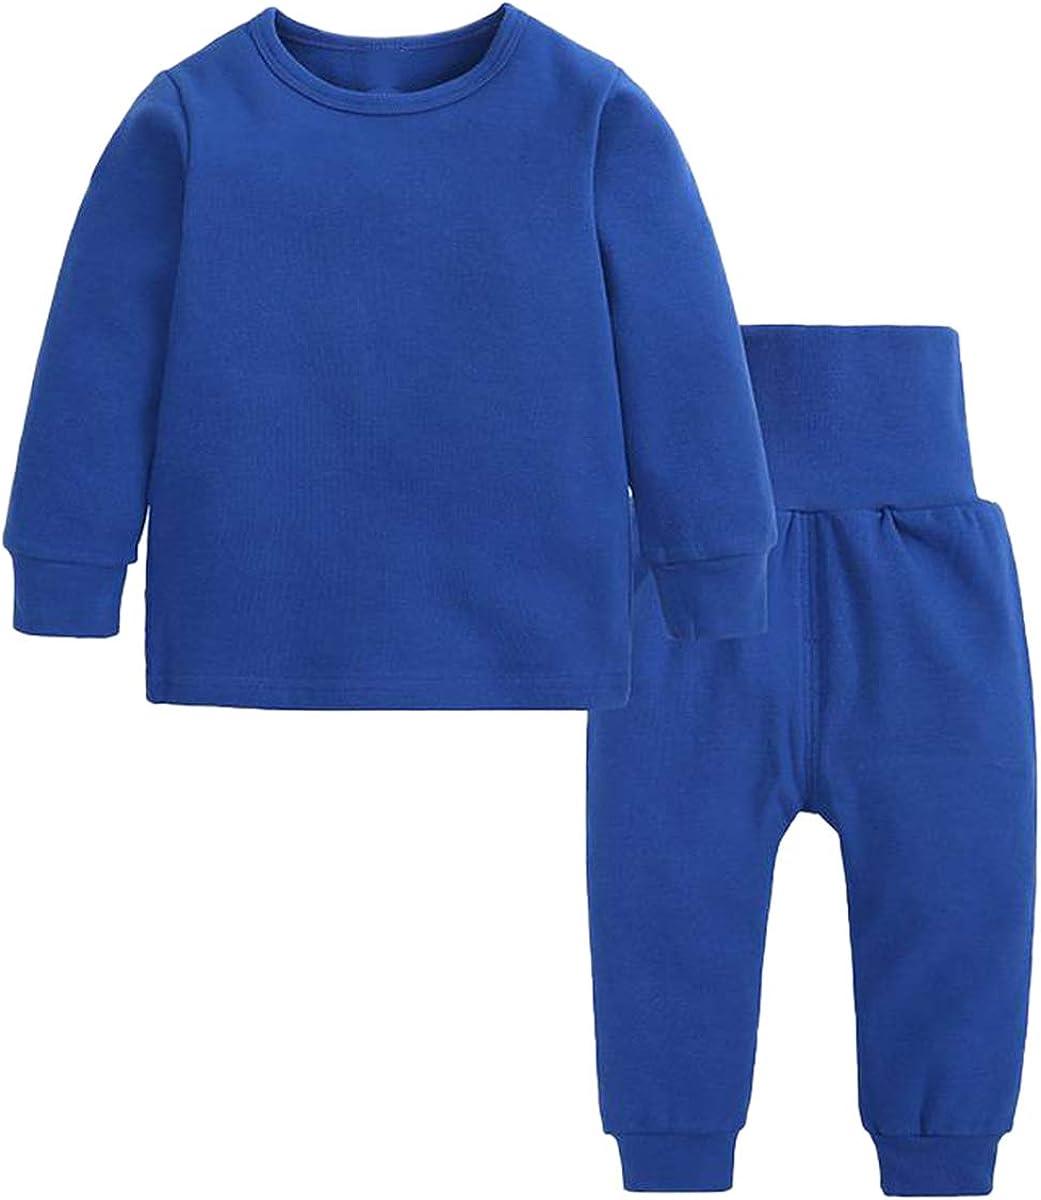 Toddler Boy's Thermal Underwear Set Base Layer Top & Bottom Set, Navy, 4-5T = Tag 130